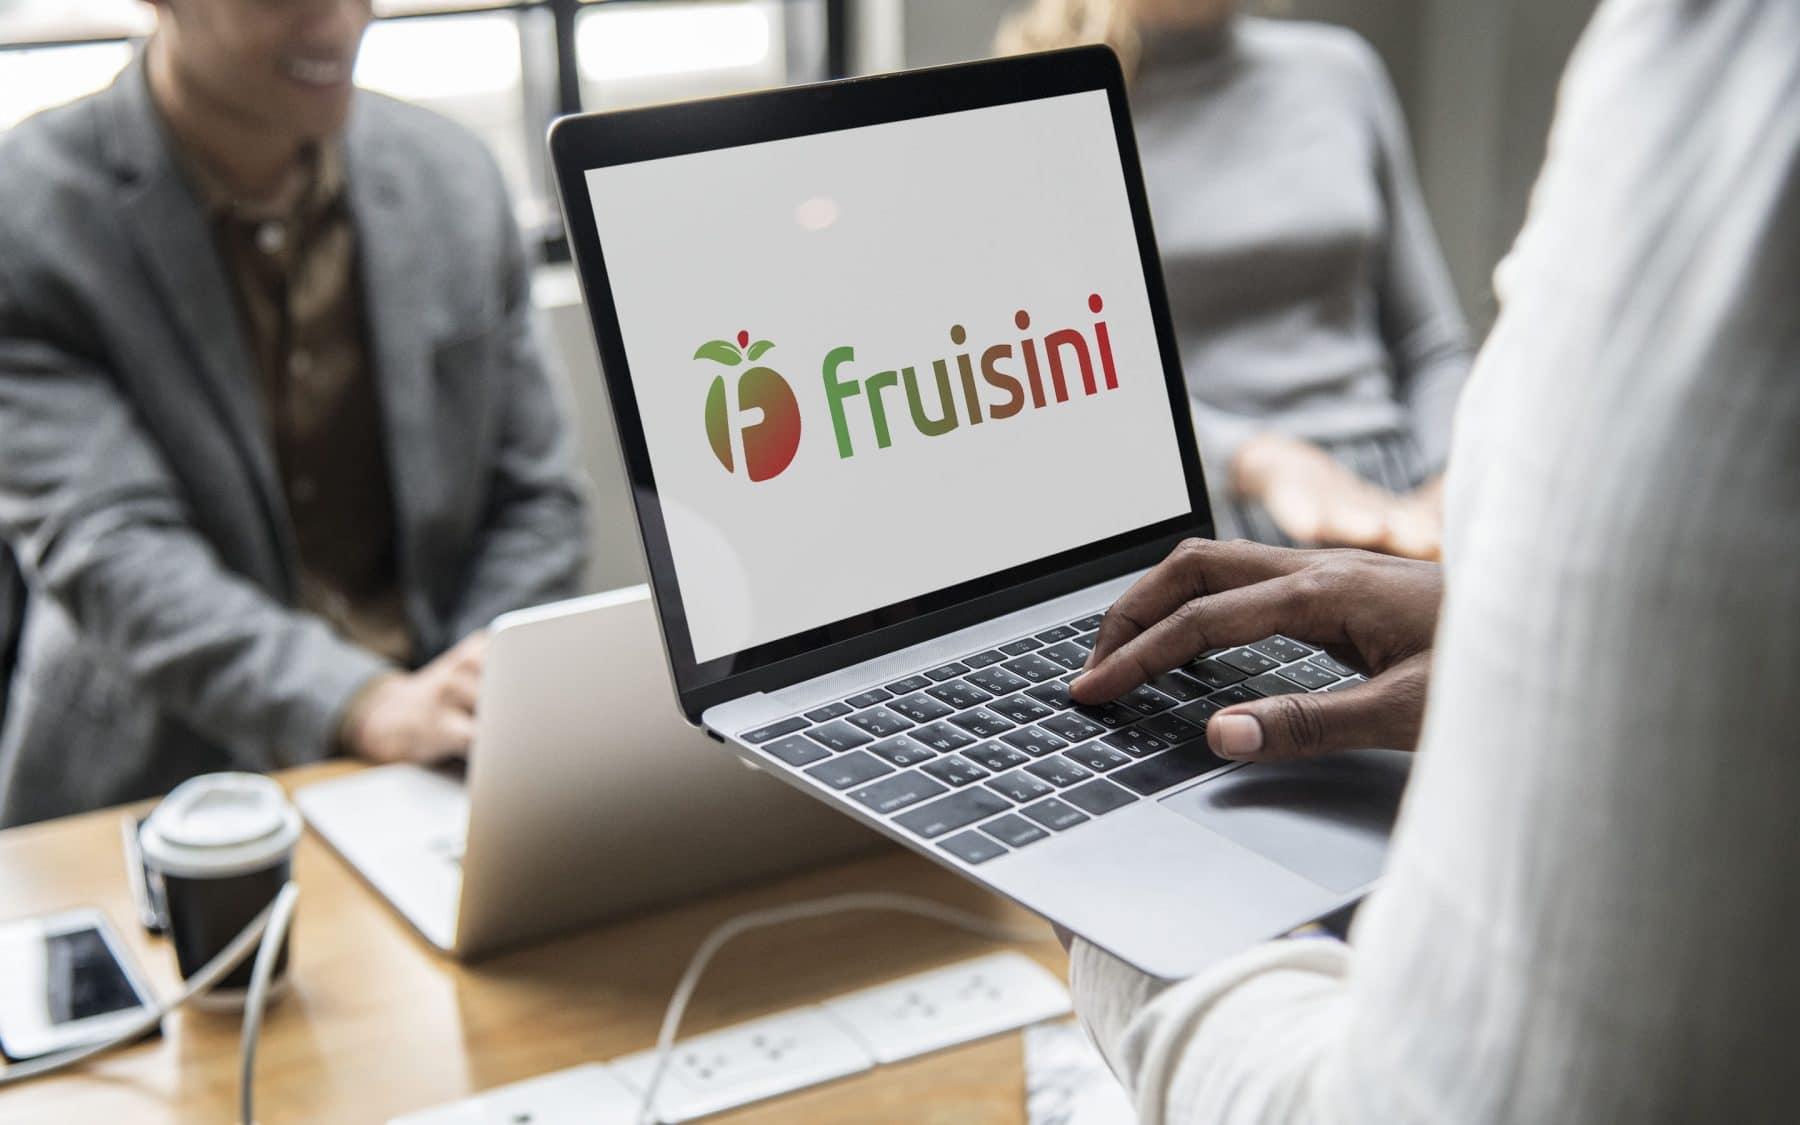 Fruisini 2